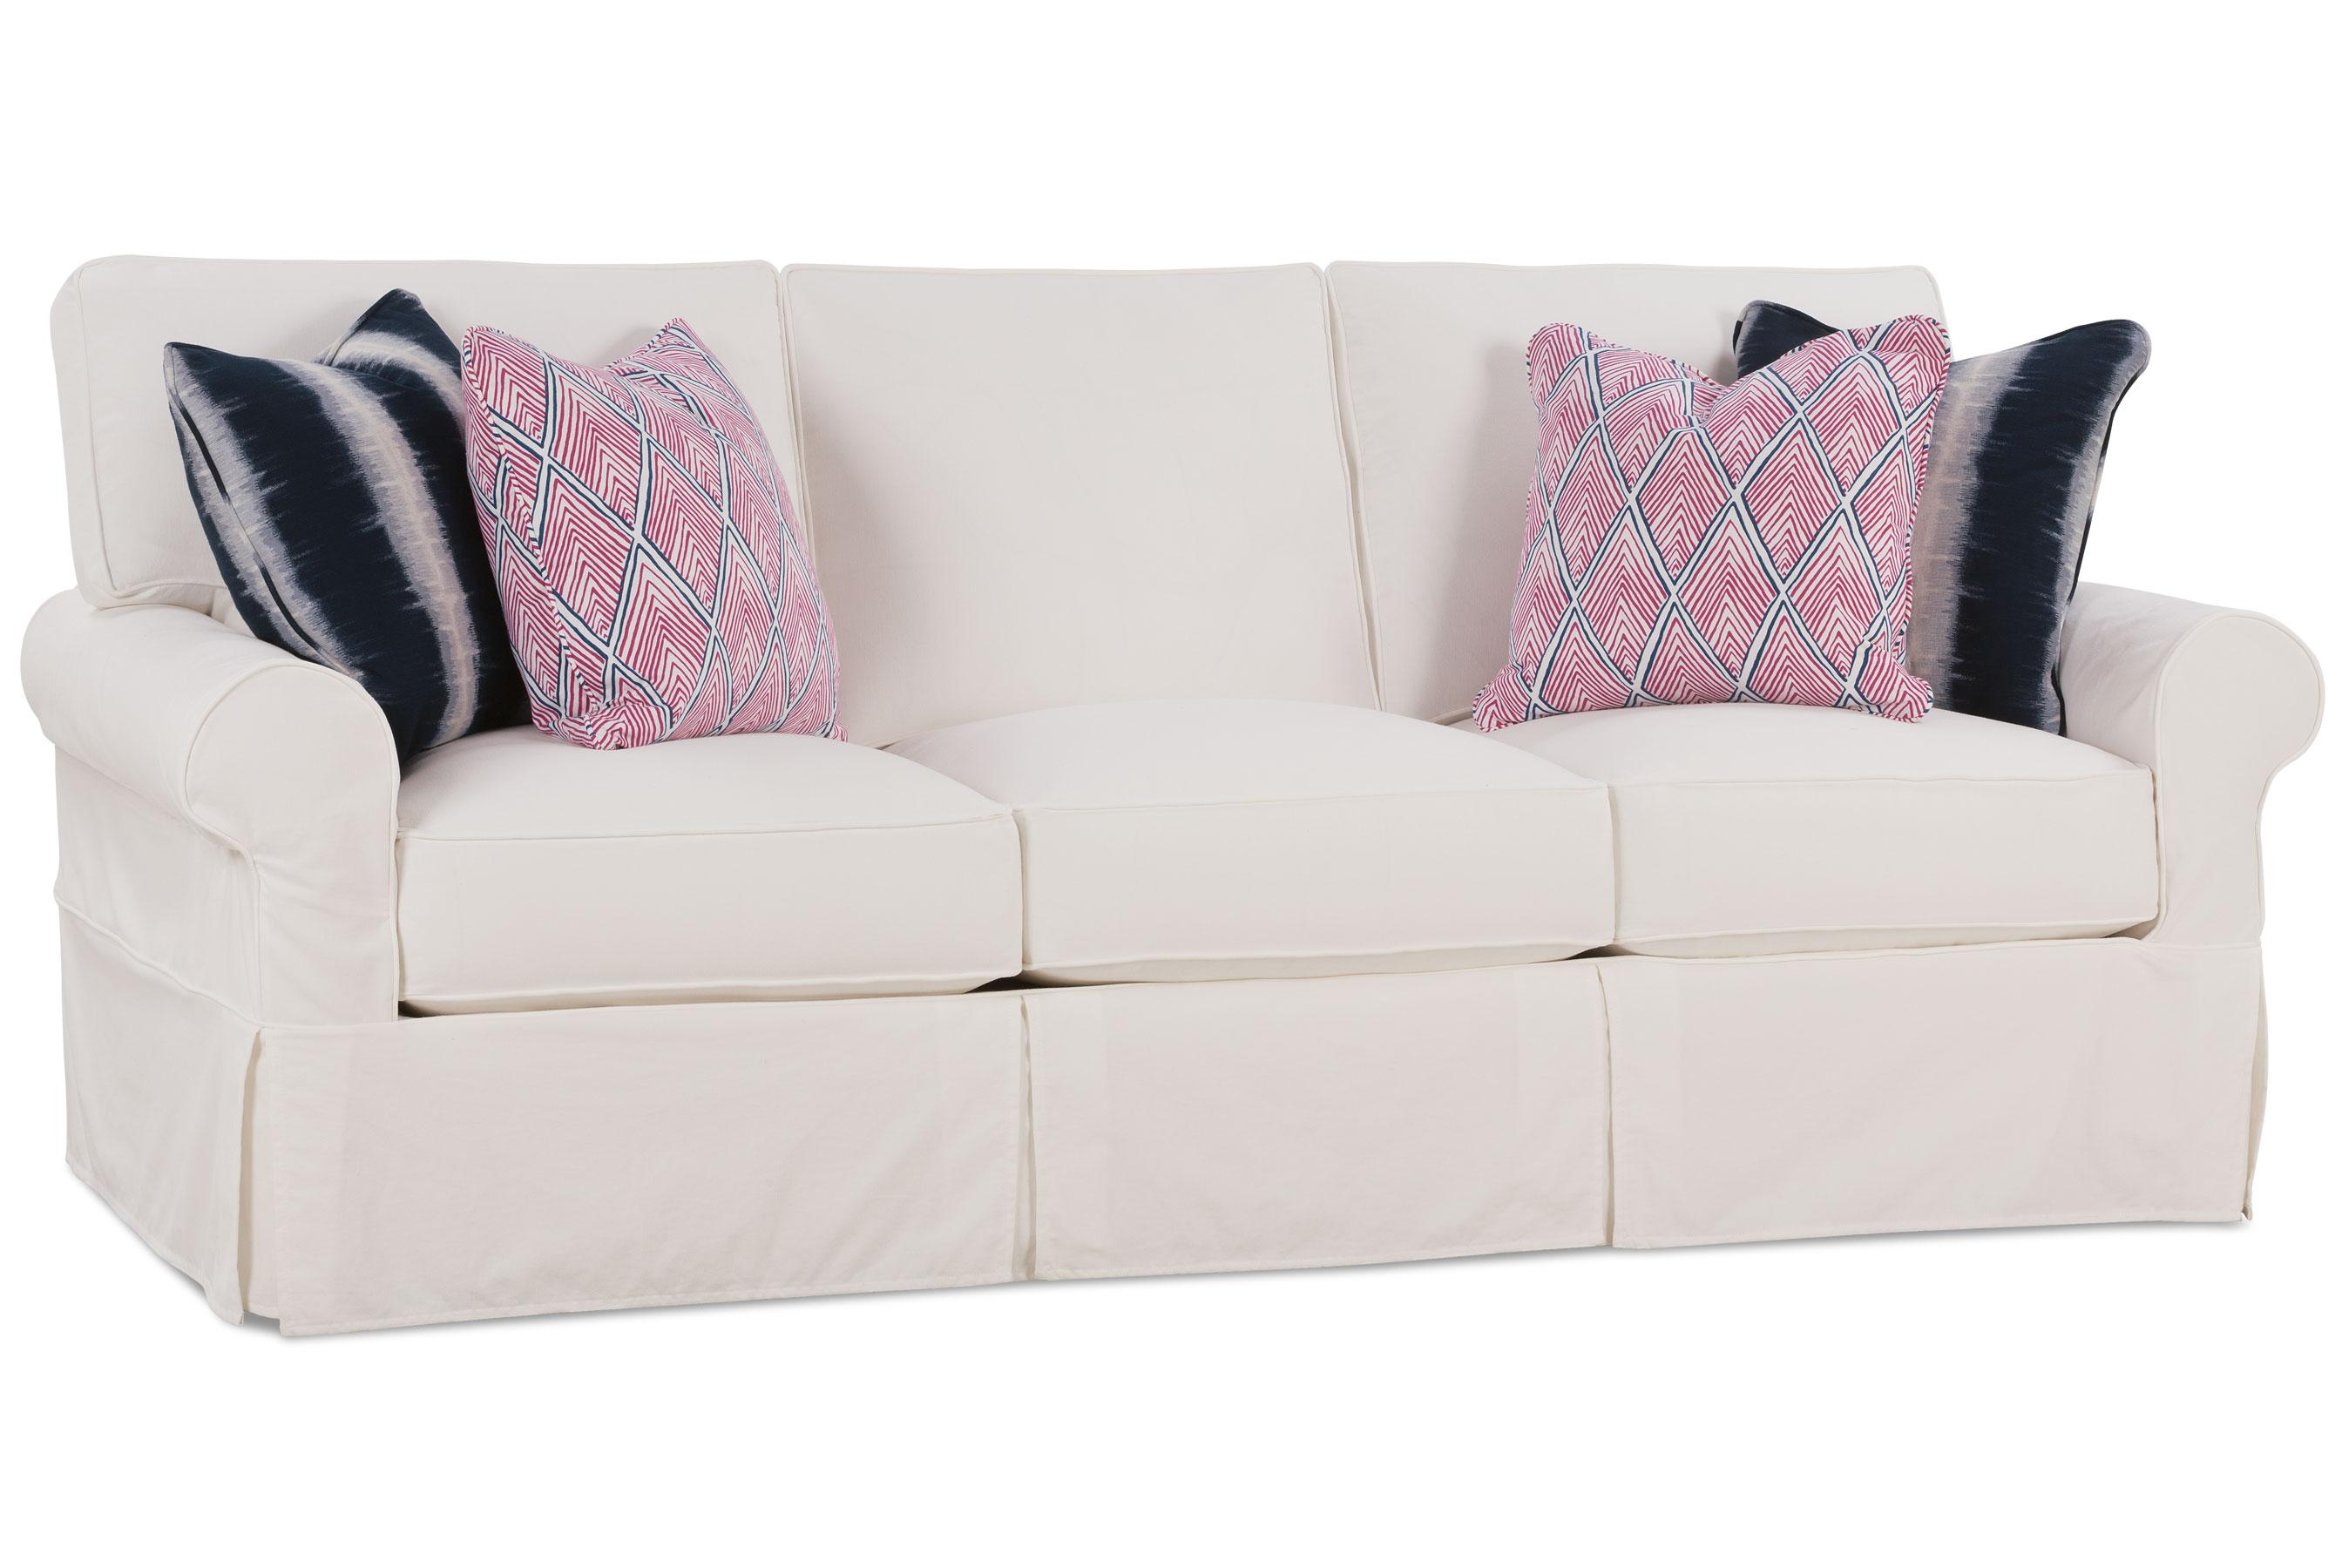 Fine Easton P275 Slipcover 90 Sofa Sofas And Sectionals Creativecarmelina Interior Chair Design Creativecarmelinacom